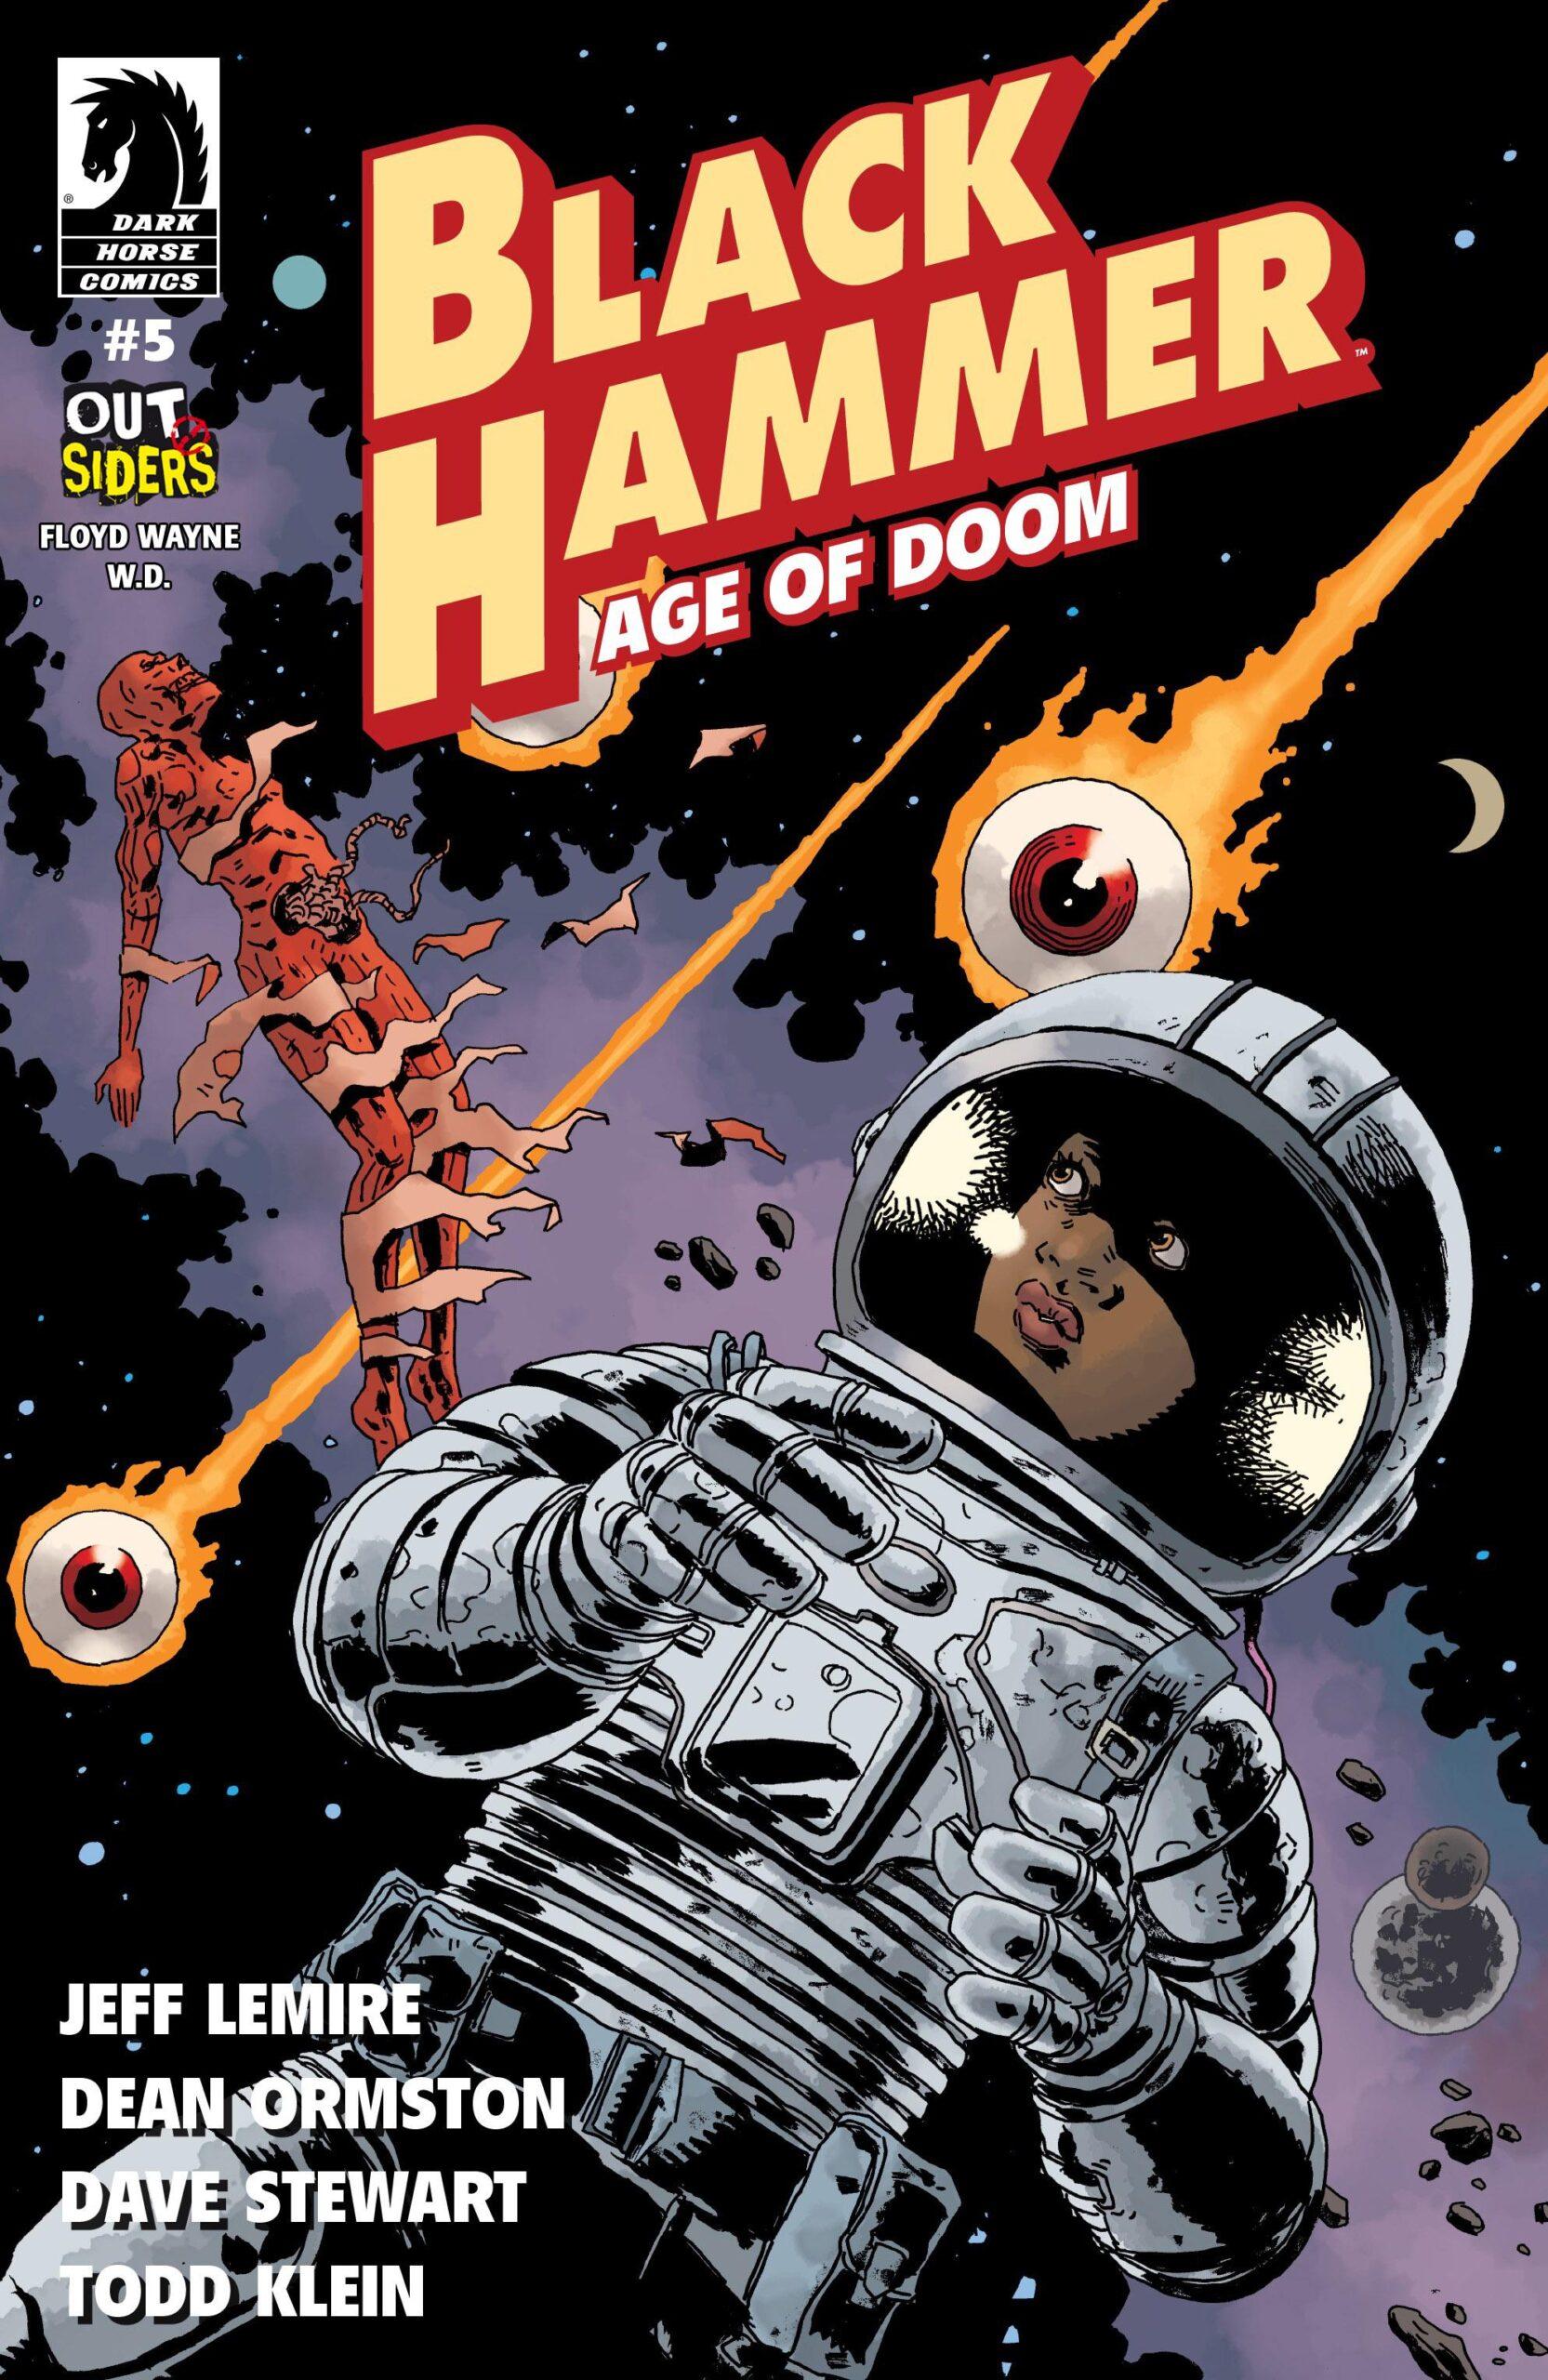 Leer Descargar Comic Black Hammer: Age of Doom Online en Español